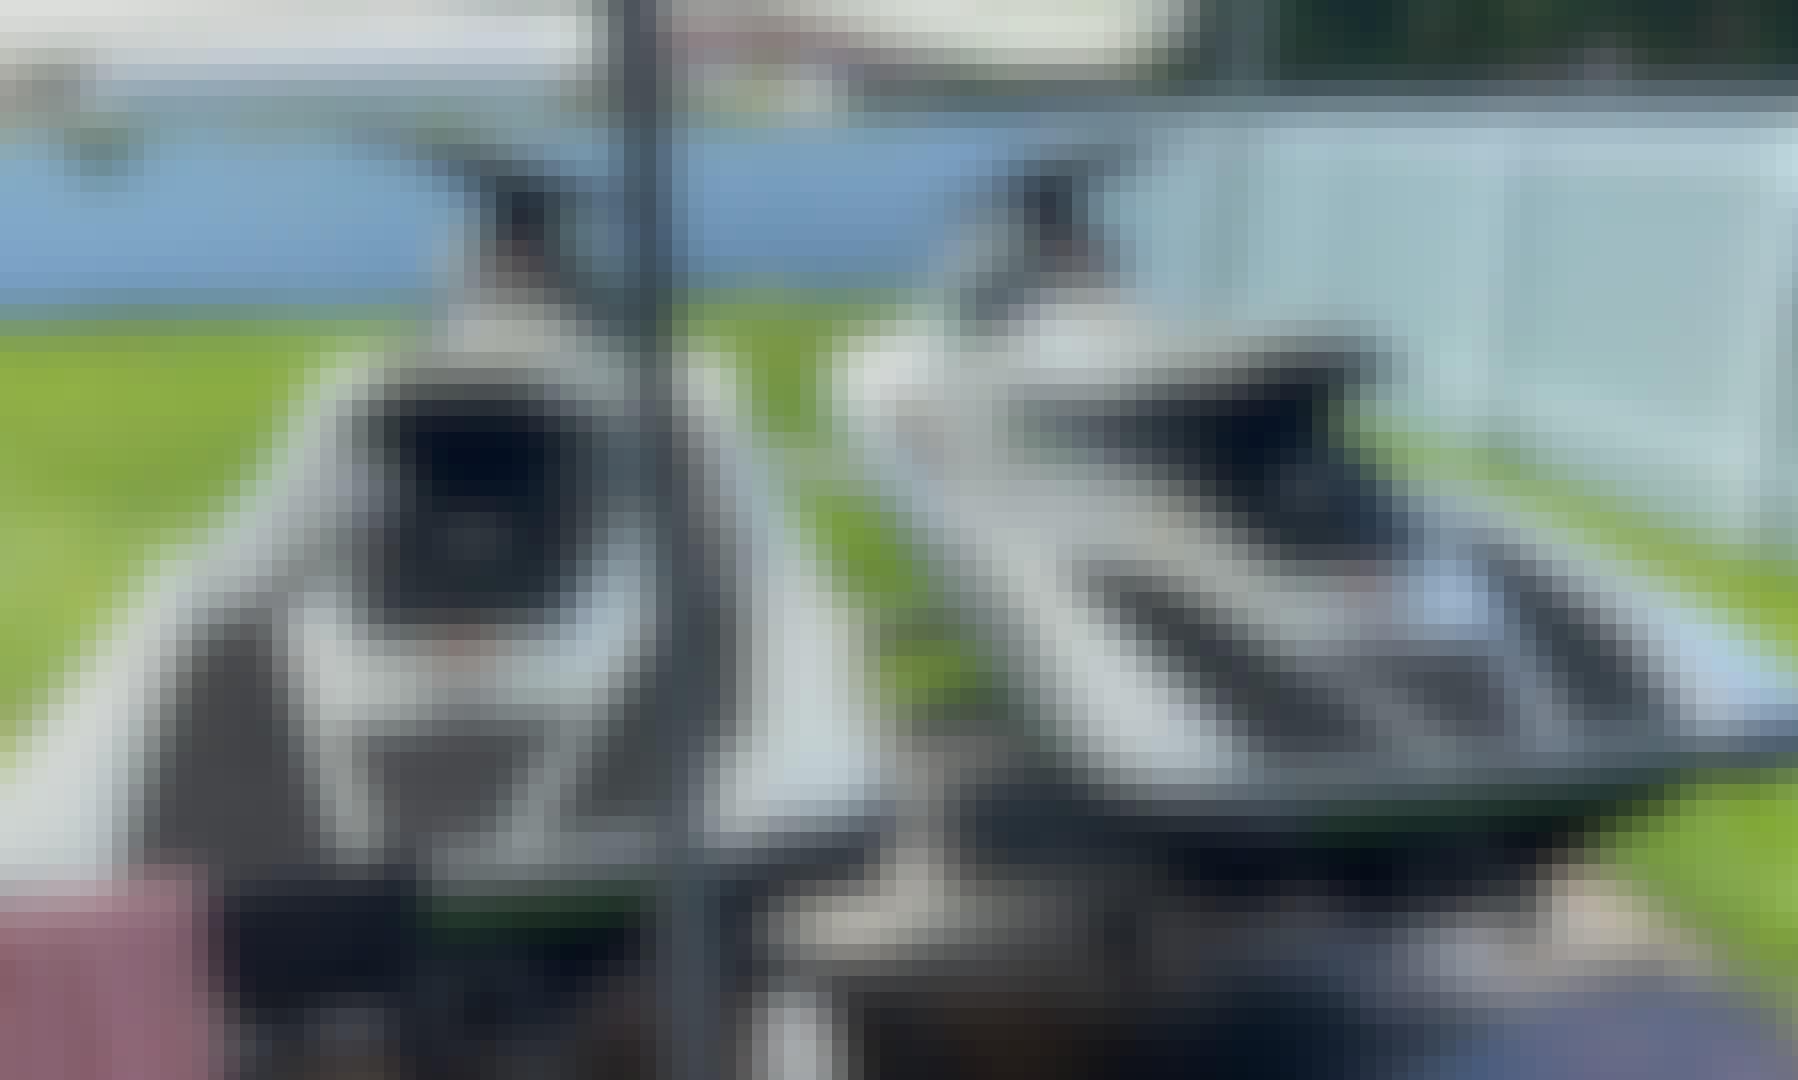 Two Yamaha EX Waverunner in West Palm Beach, Florida